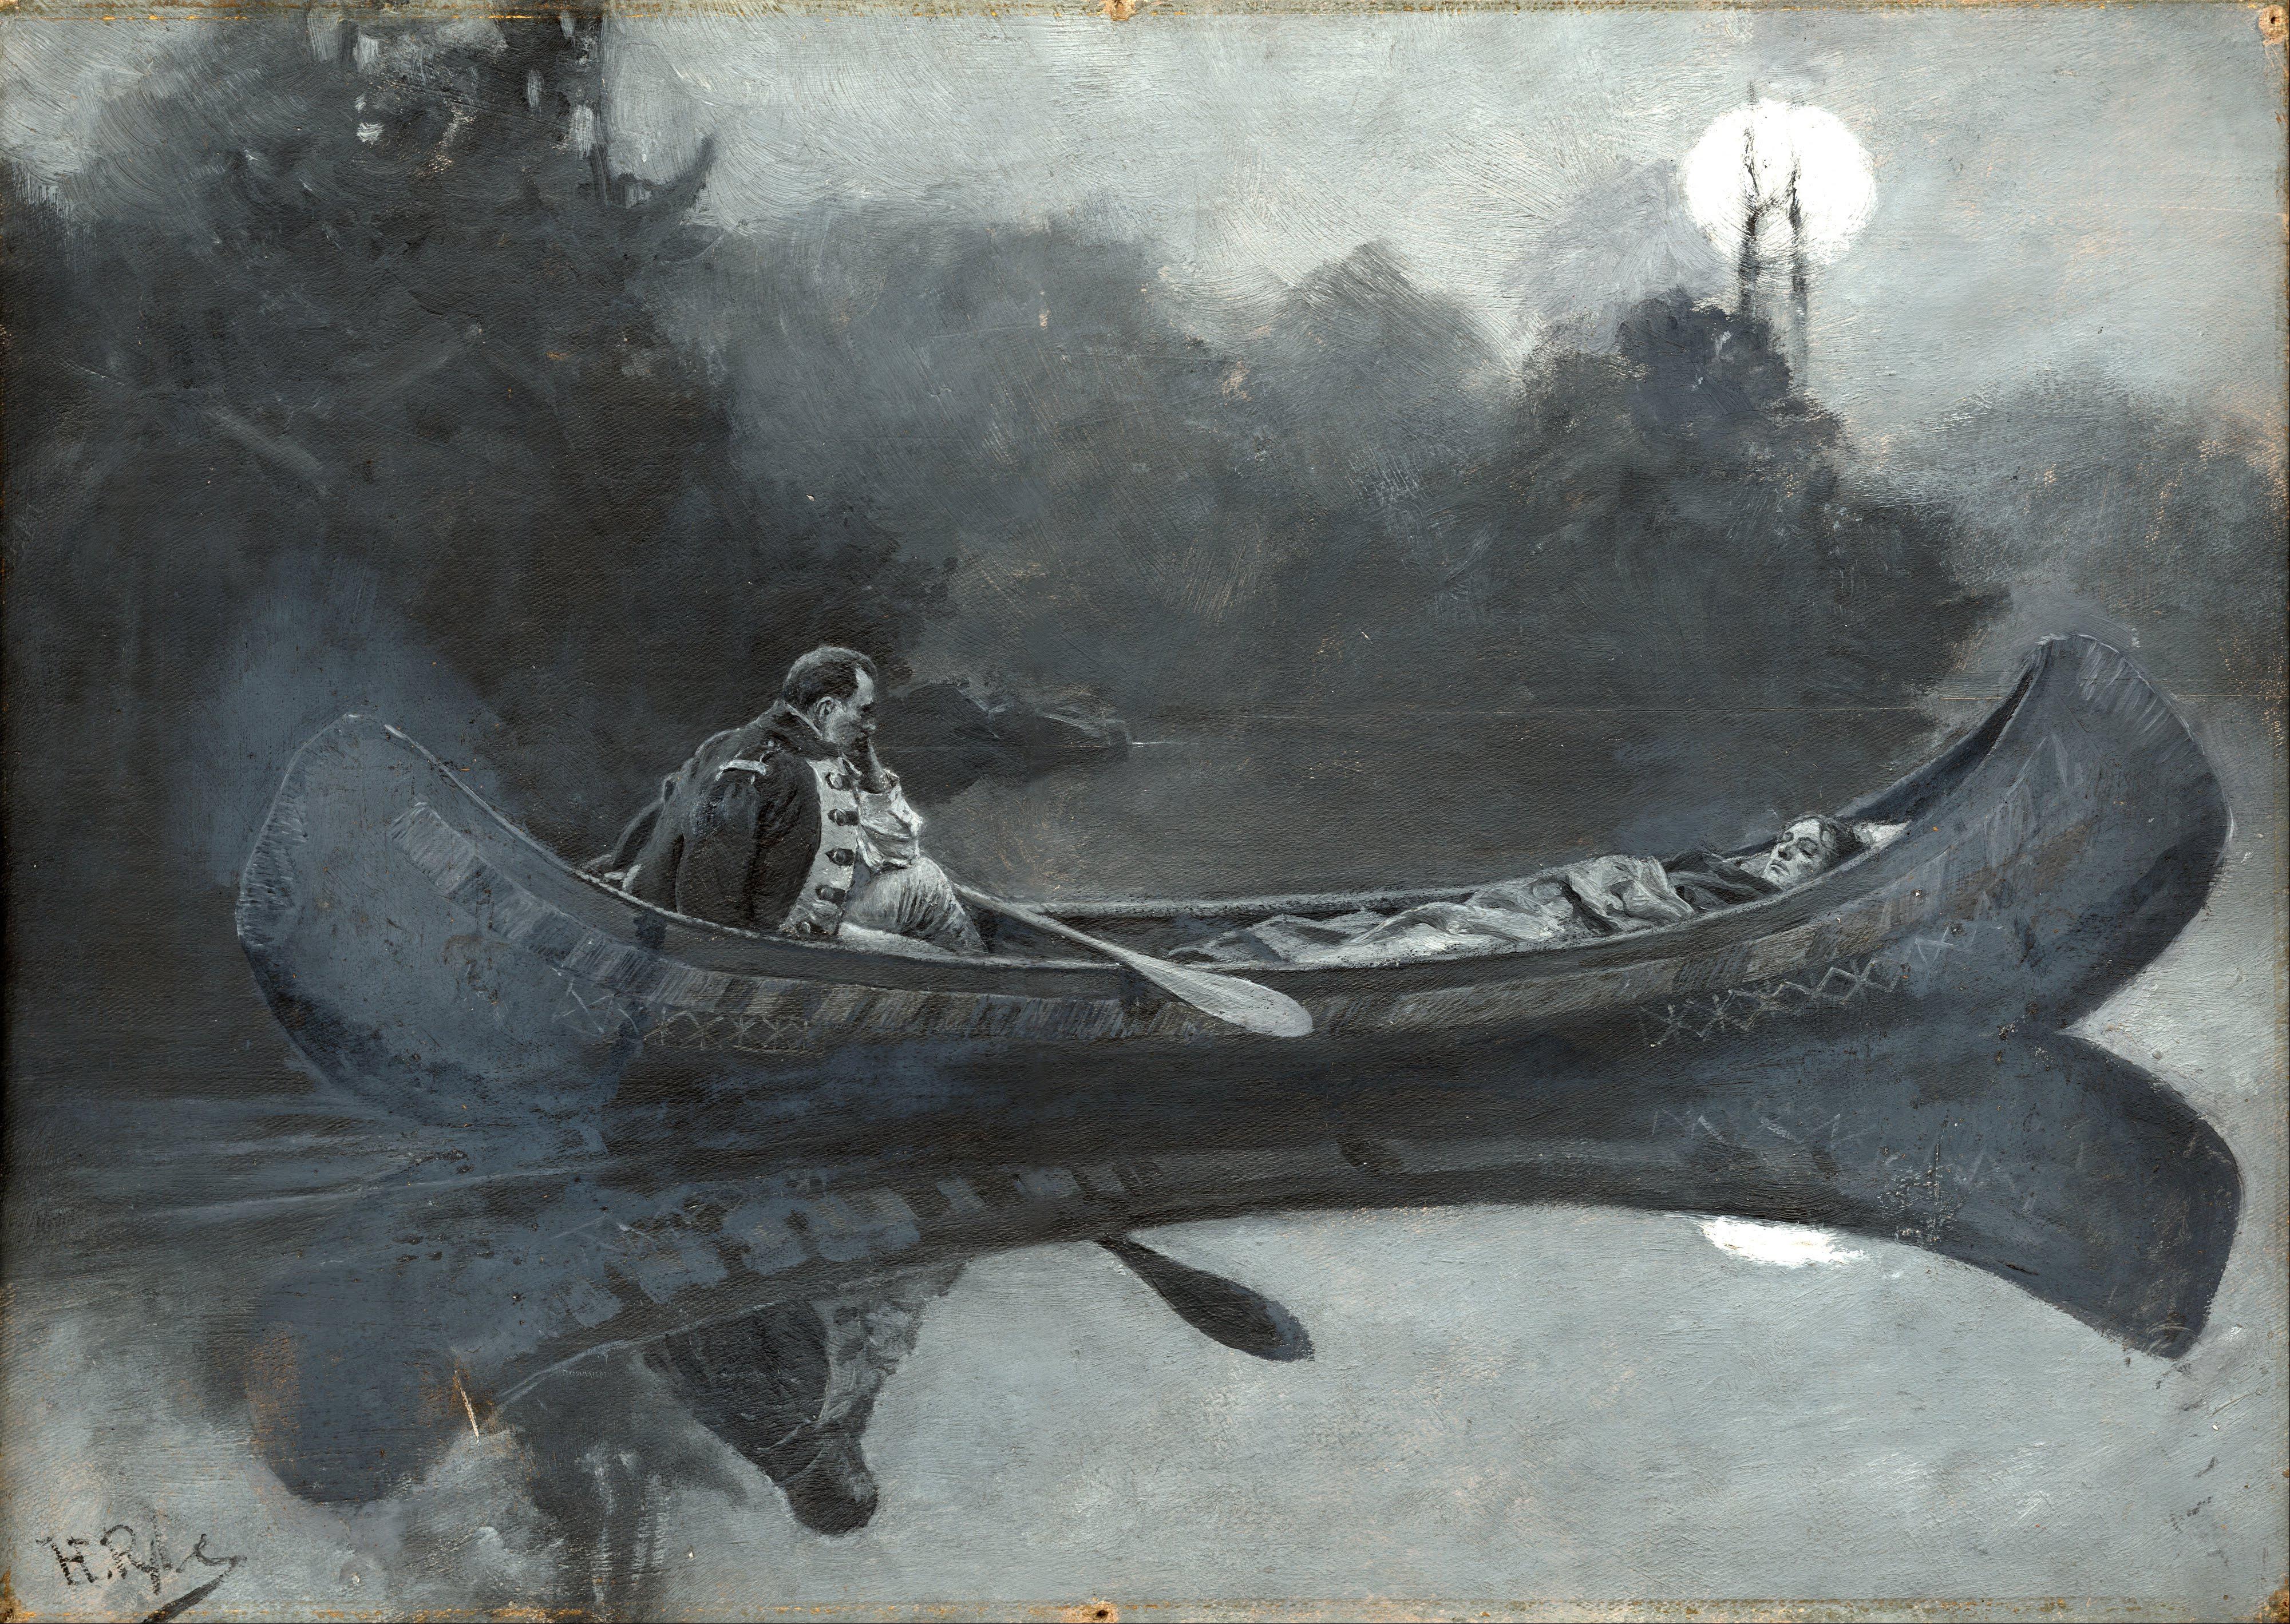 Pyle canoe